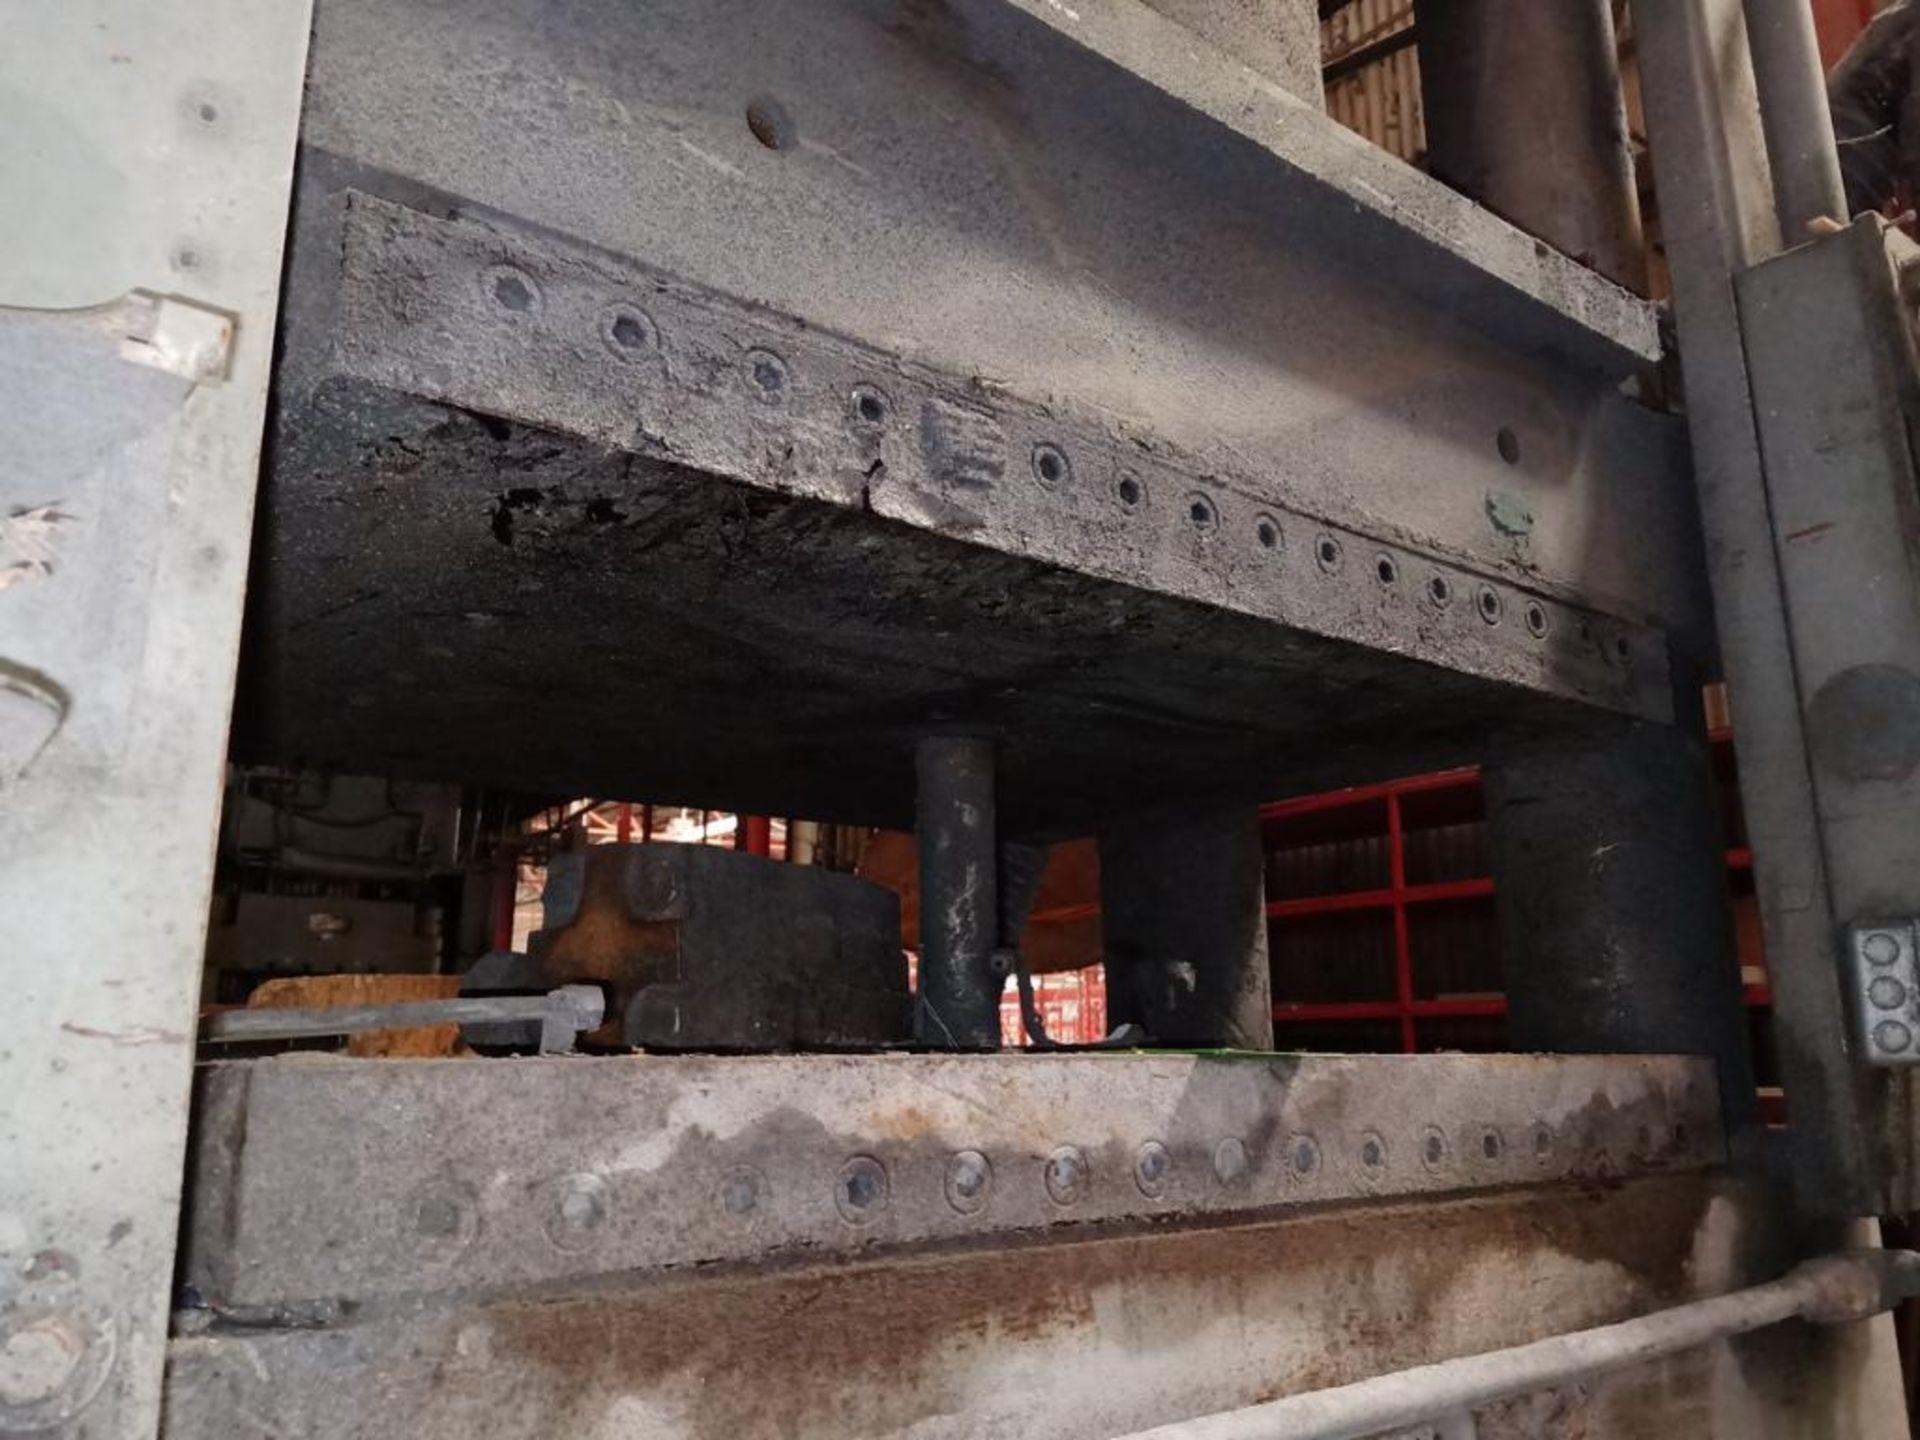 HPM 500T 4-Post Compression Molding Press - Image 2 of 5